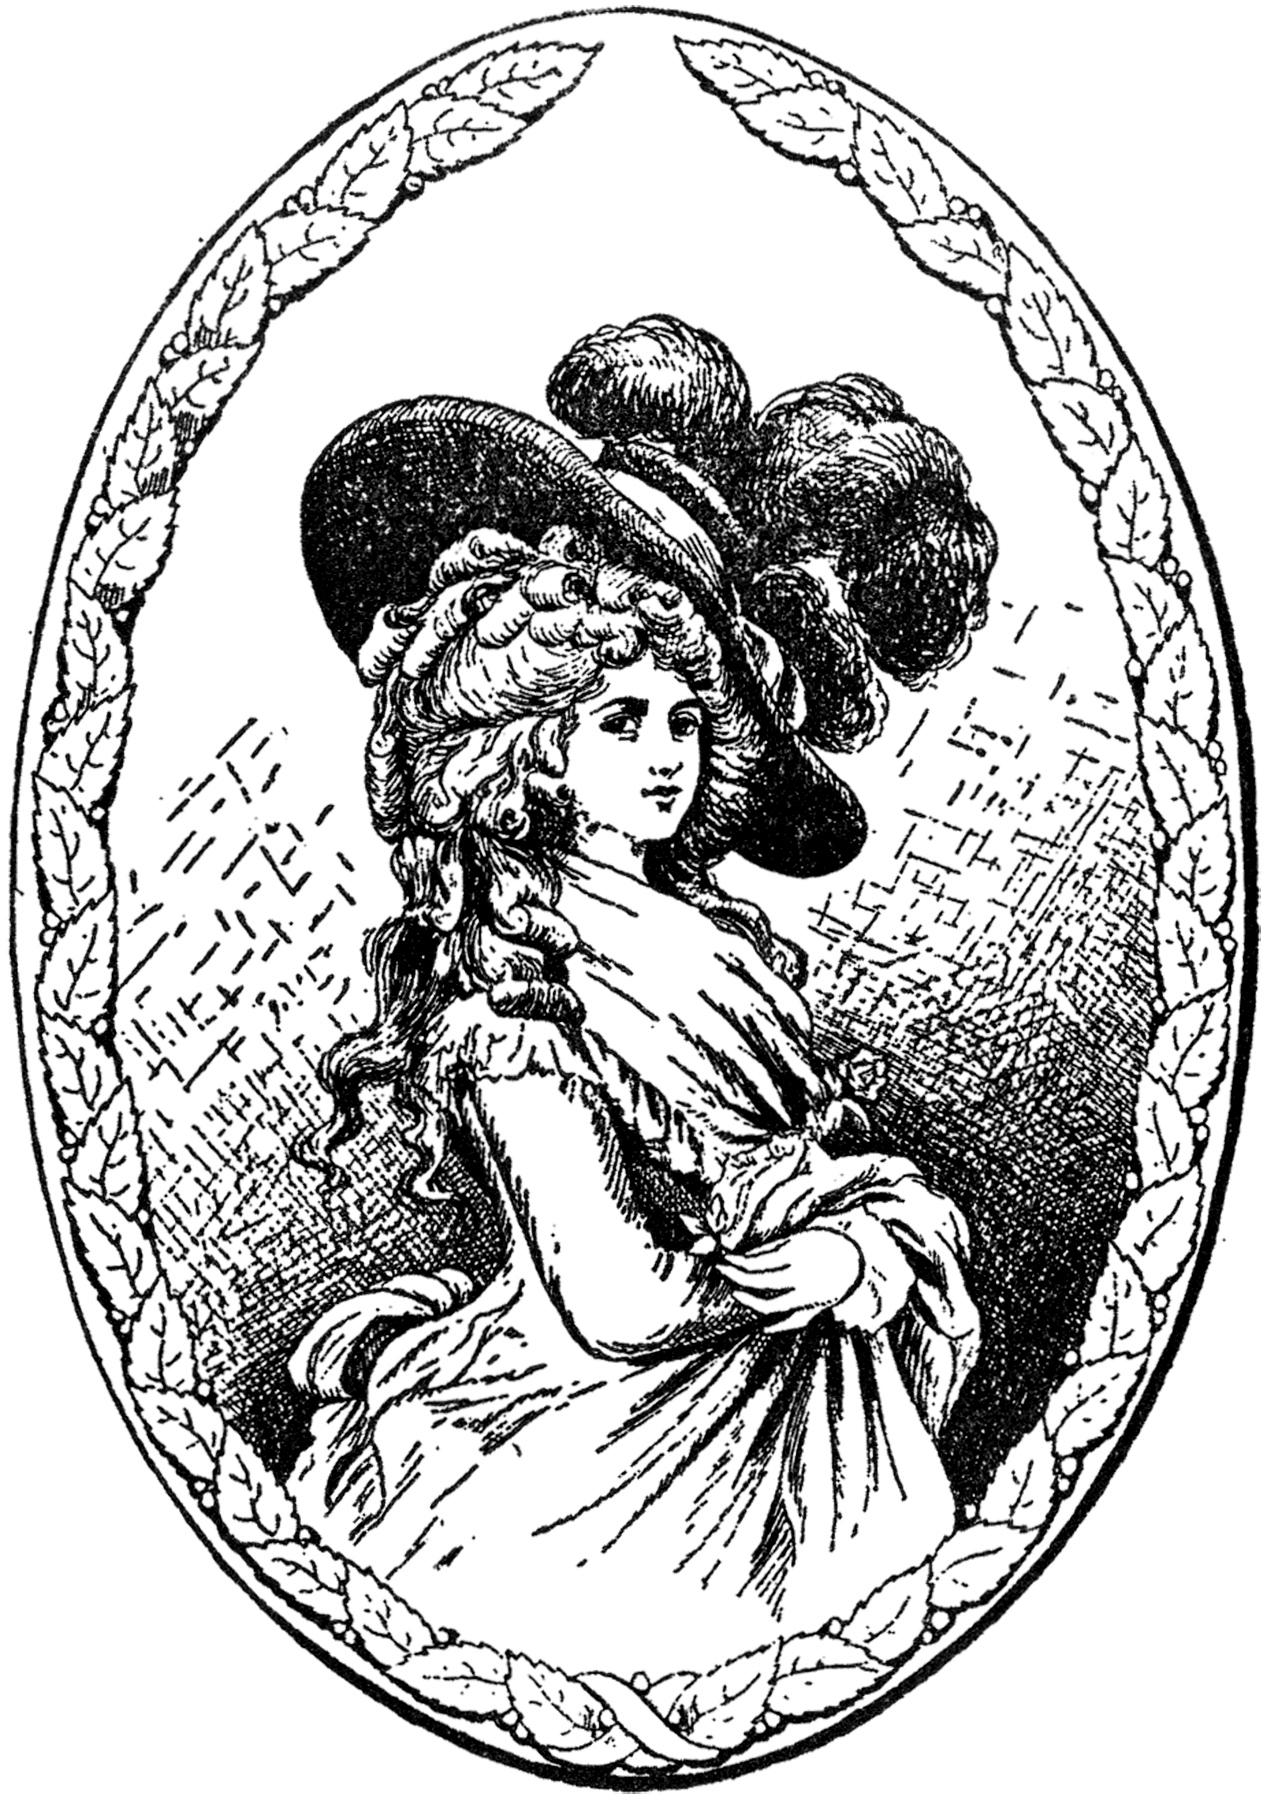 Duchess of Devonshire Image